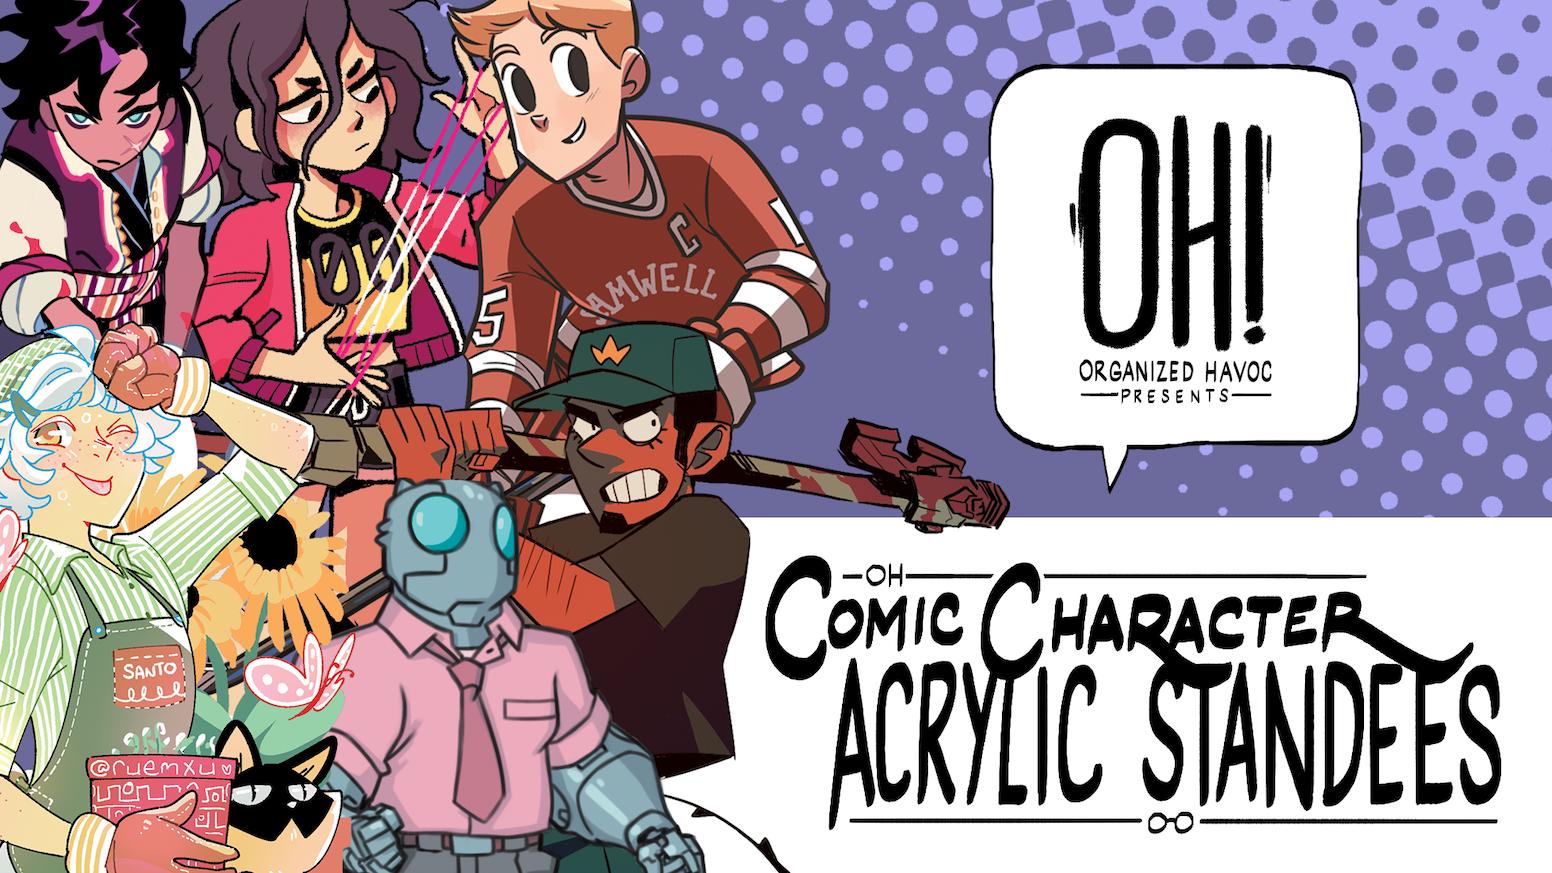 Comic Character Acrylic Standees! by George Rohac — Kickstarter